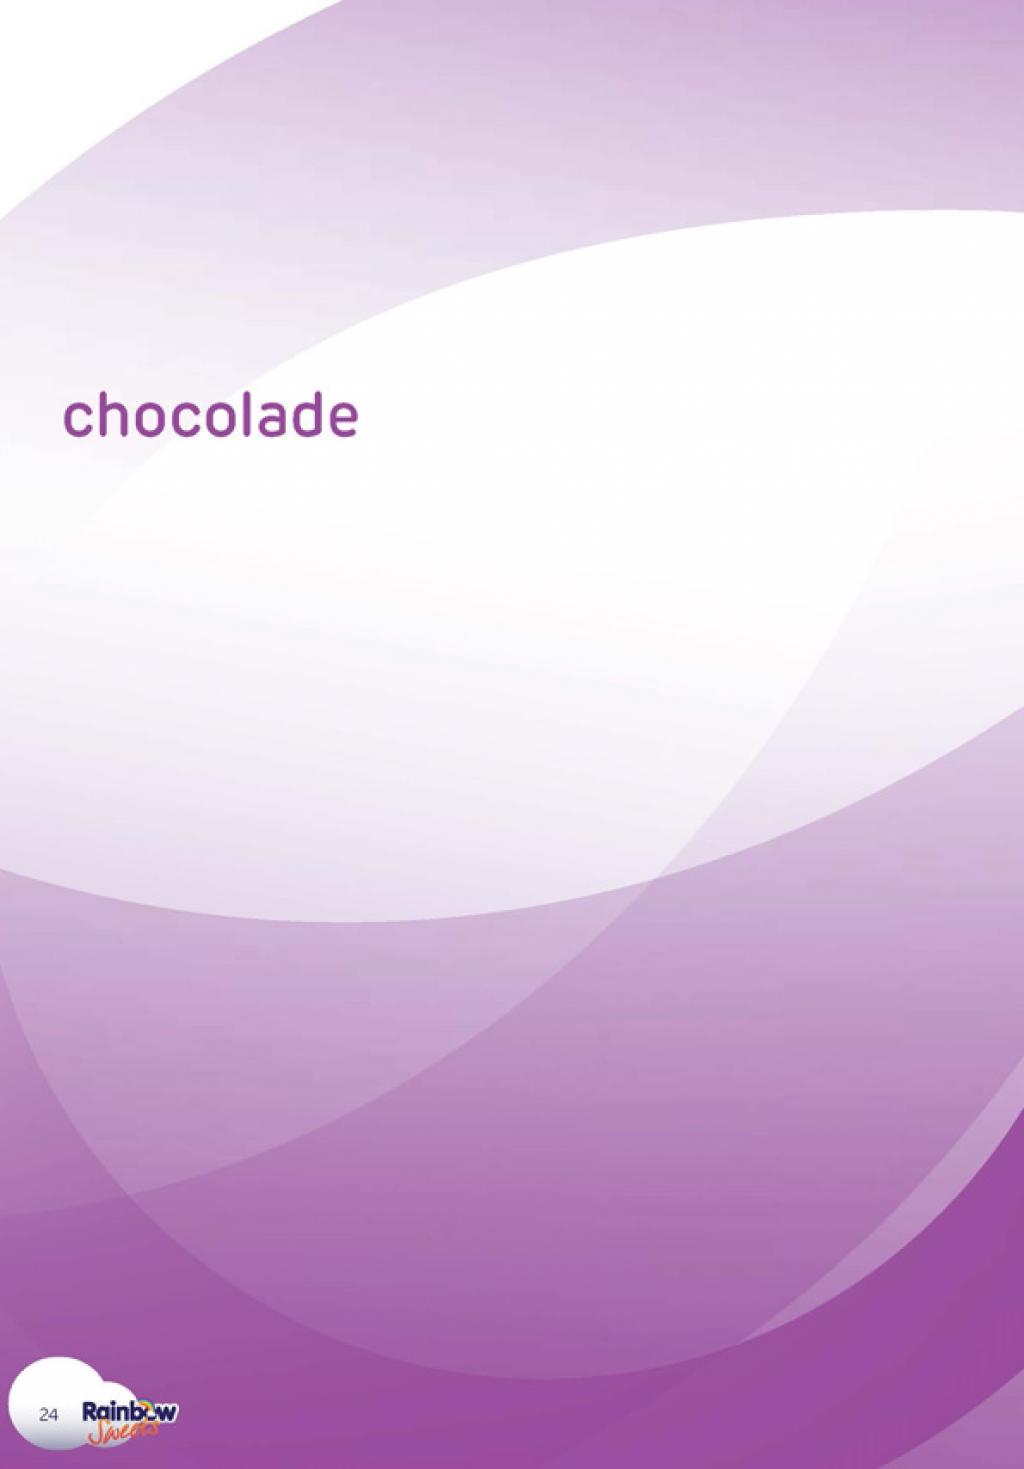 web-LR_RBS1208B_chocolade_V3_Page_01.jpg